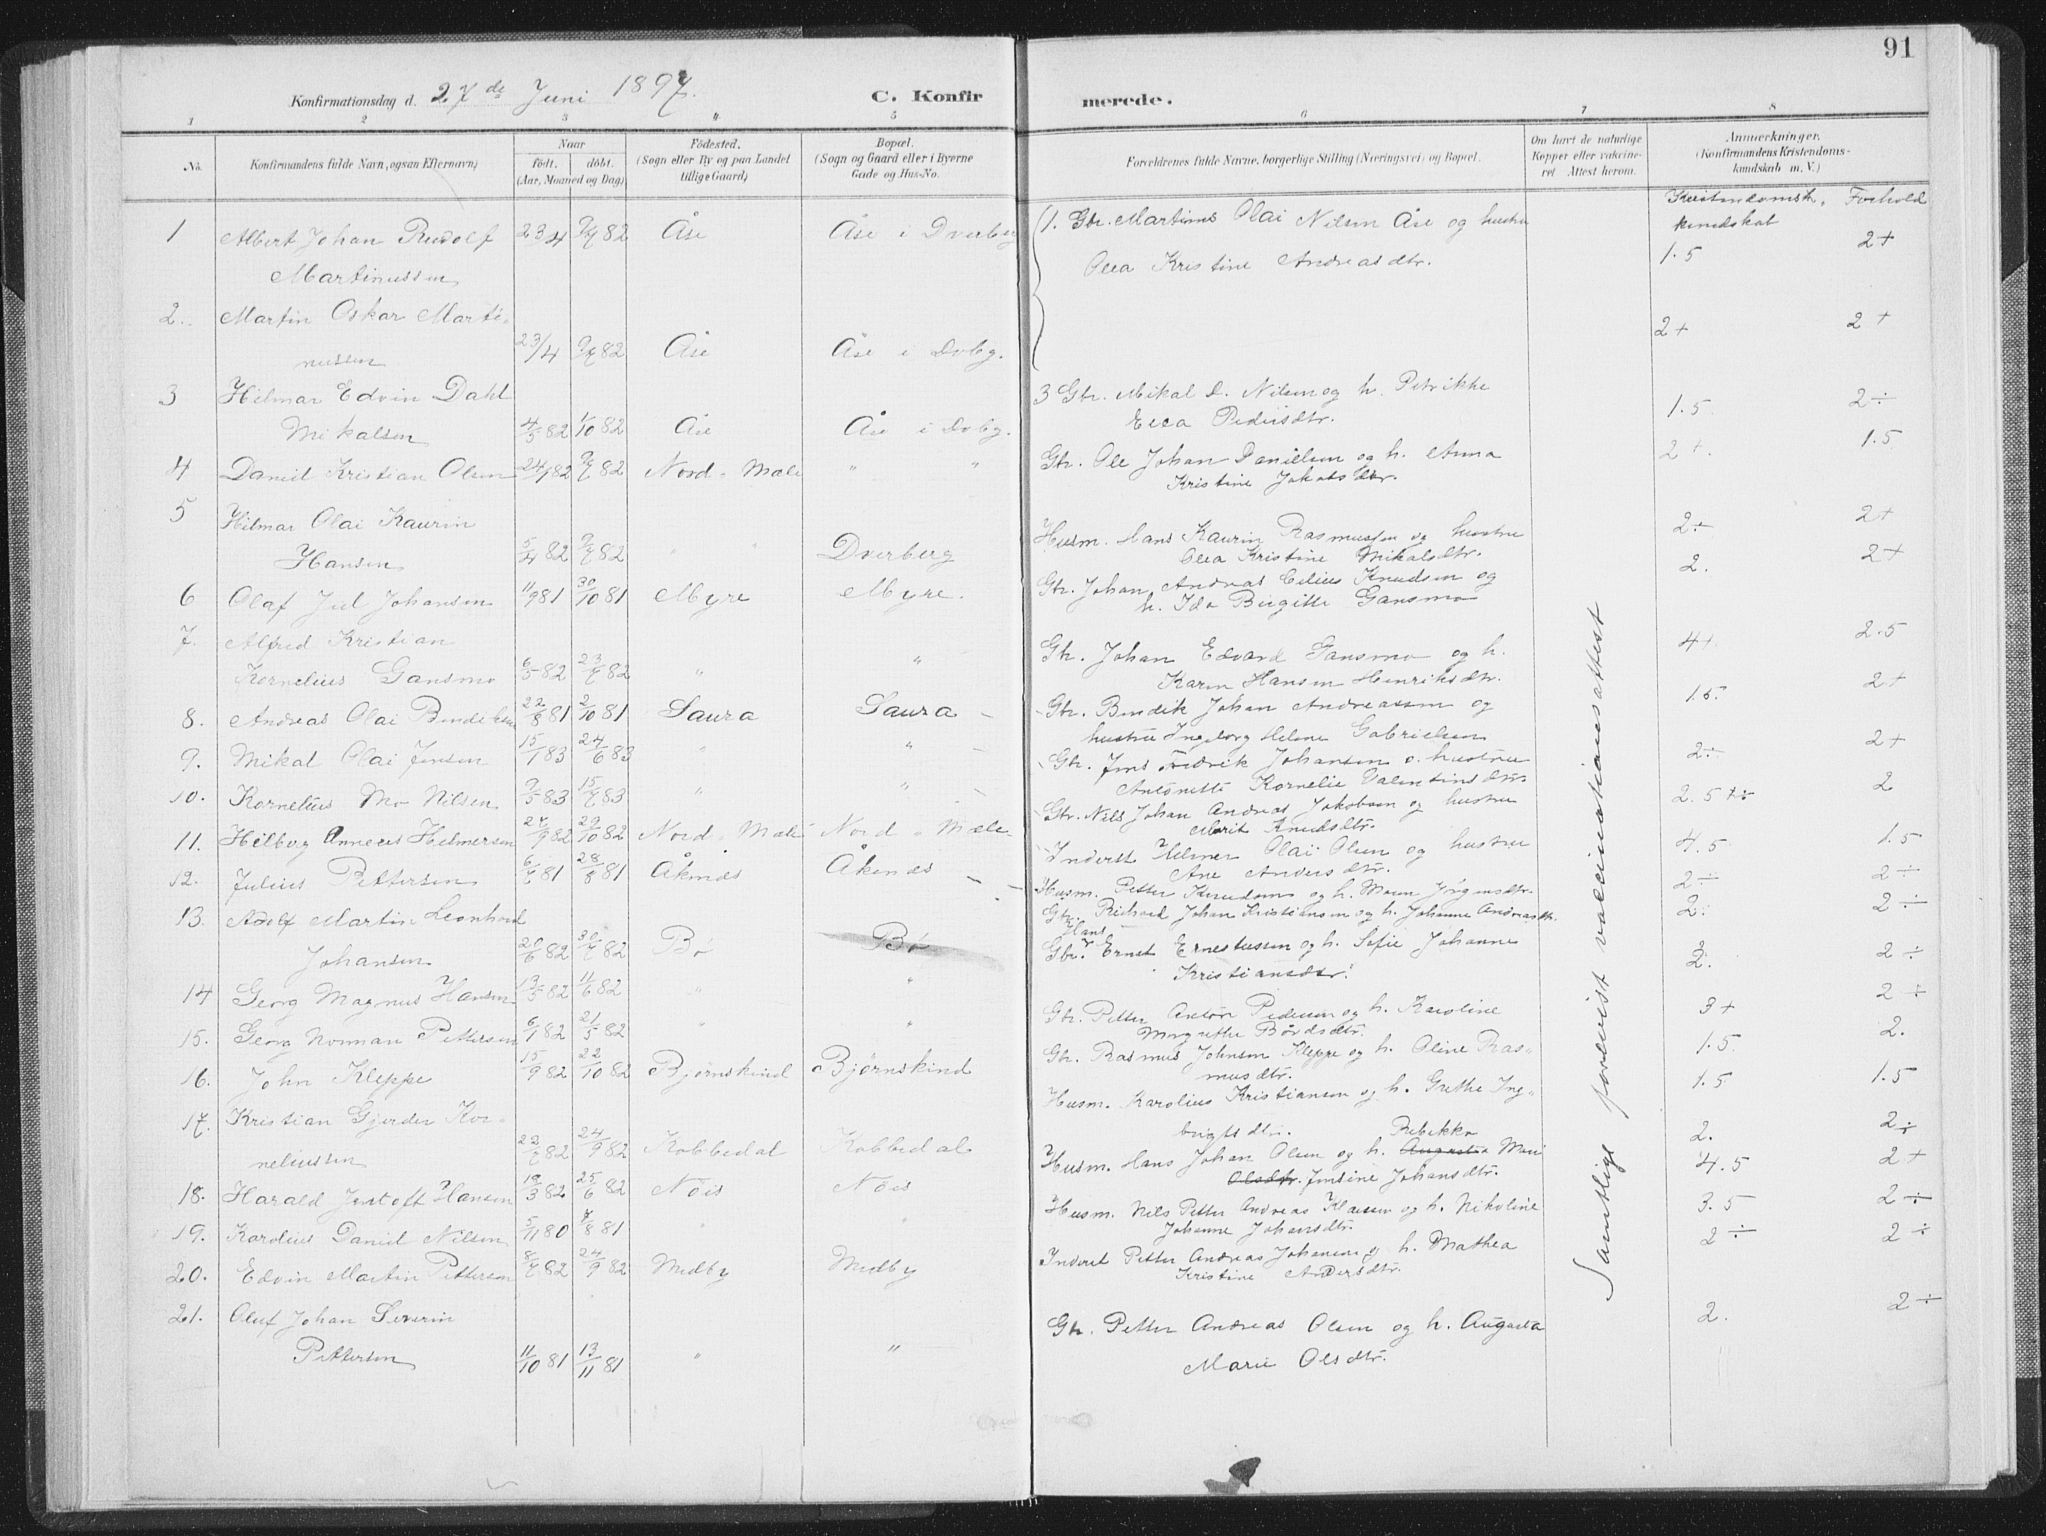 SAT, Ministerialprotokoller, klokkerbøker og fødselsregistre - Nordland, 897/L1400: Ministerialbok nr. 897A07, 1897-1908, s. 91